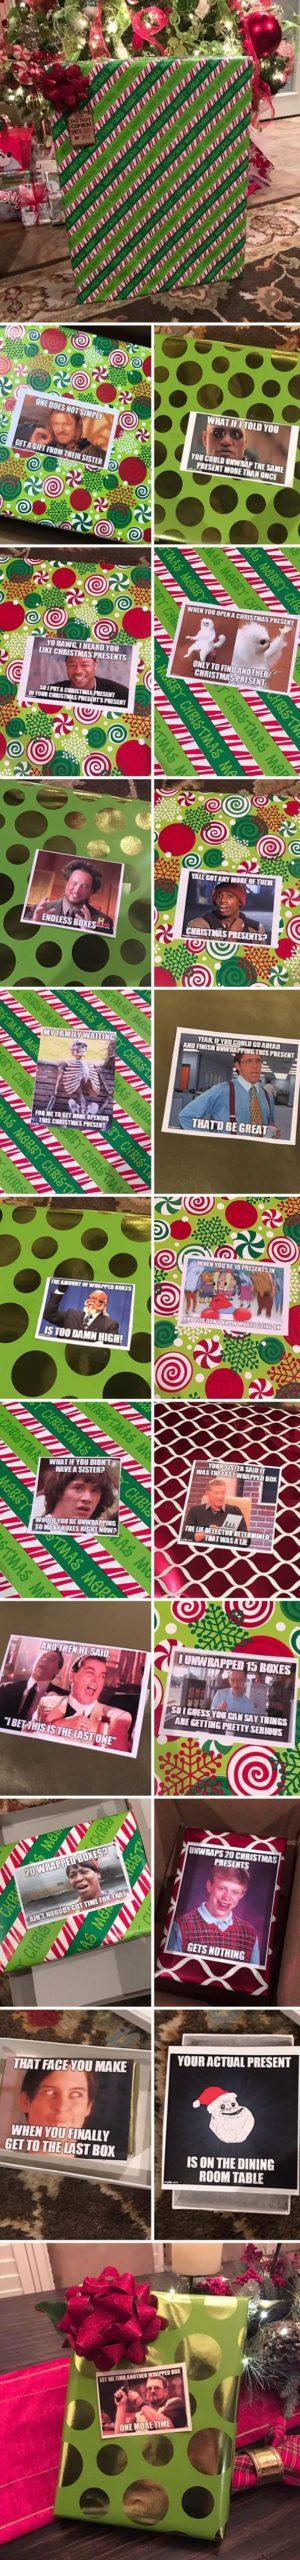 funny Christmas gift ideas